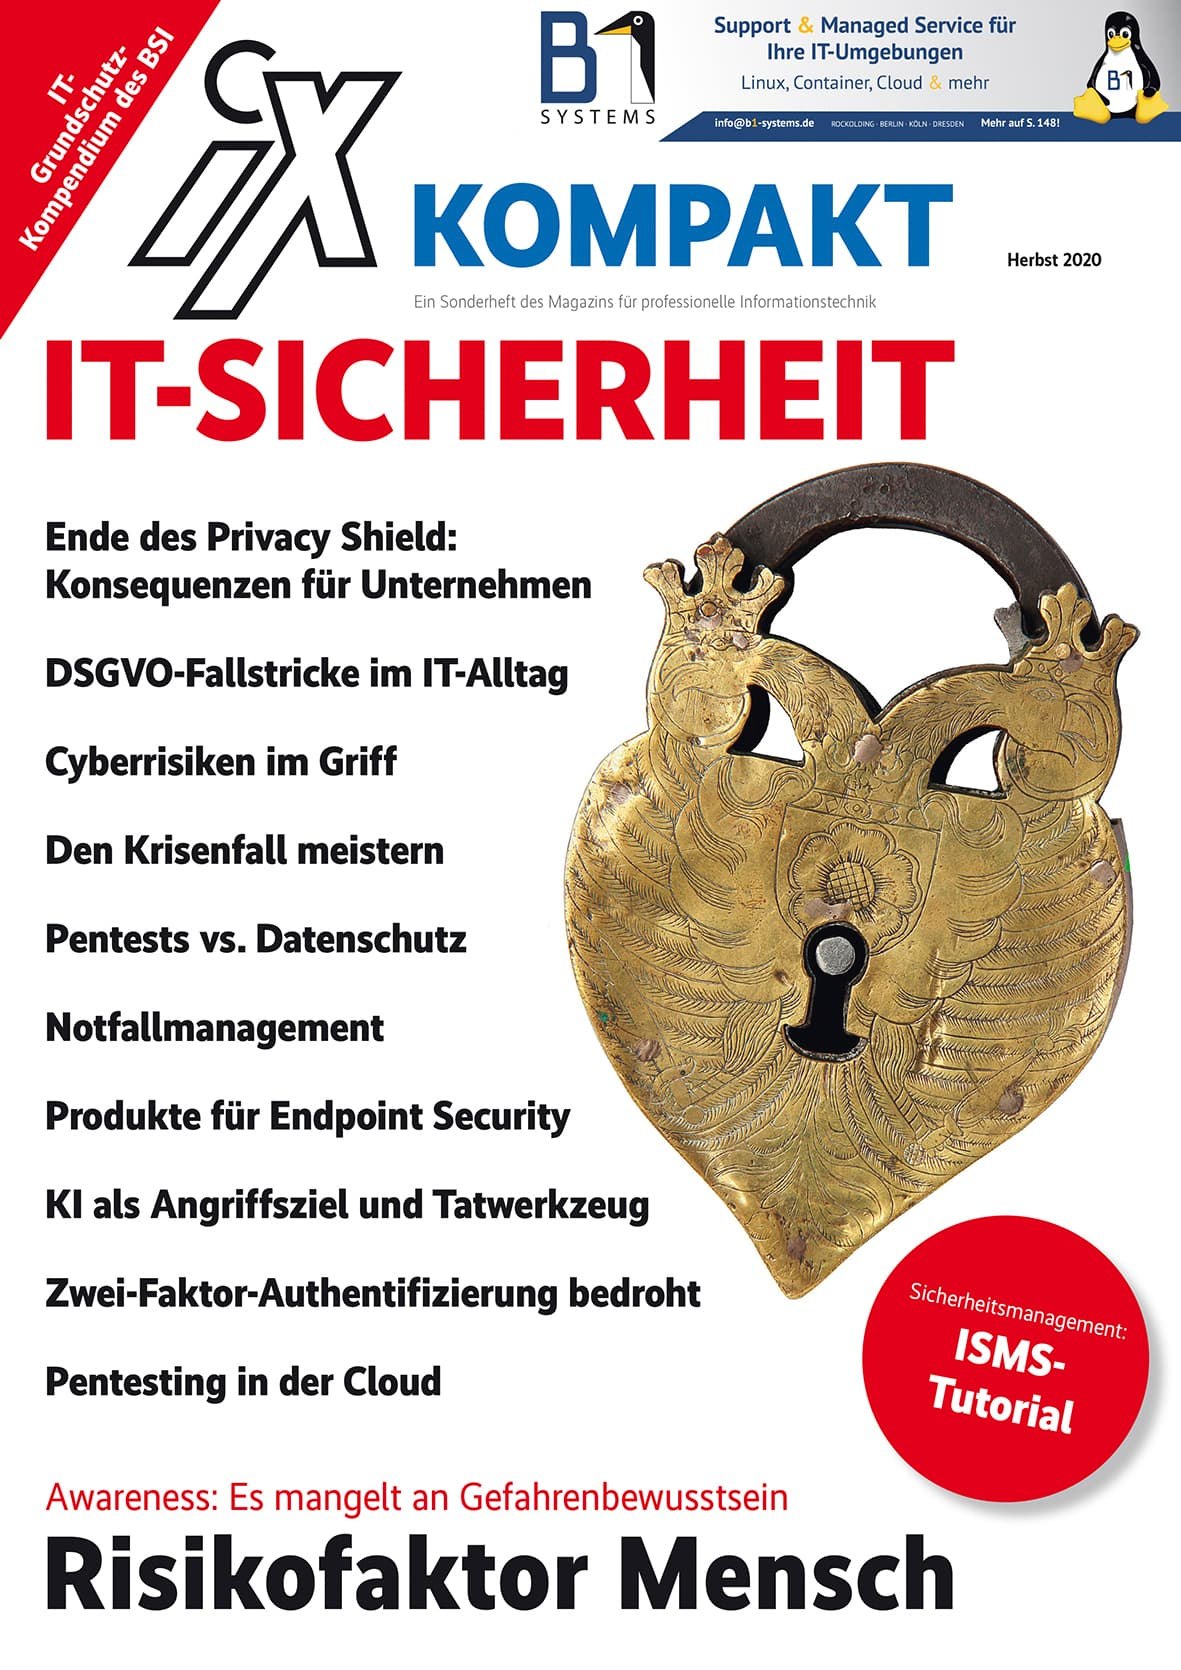 iX Kompakt IT-Sicherheit